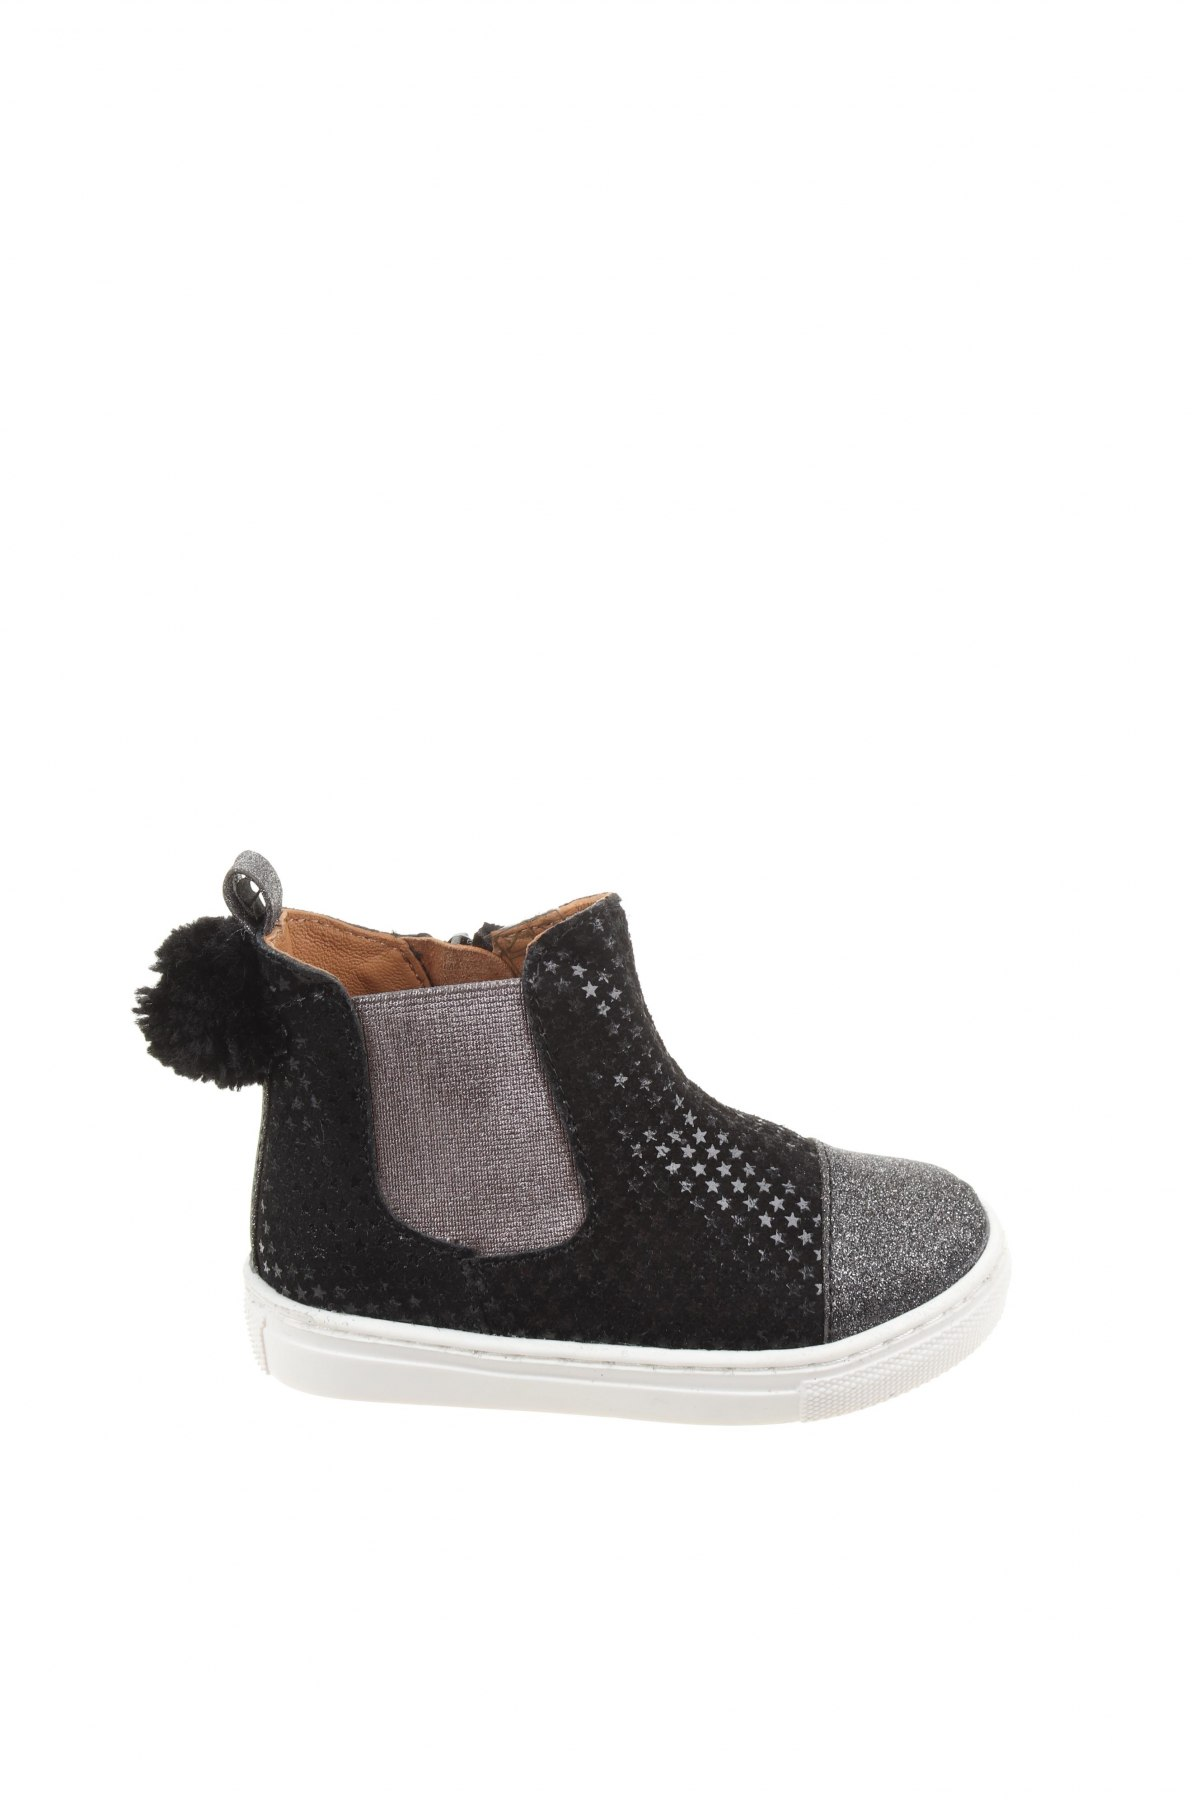 Детски обувки Oca-Loca, Размер 24, Цвят Черен, Естествен велур, Цена 129,00лв.